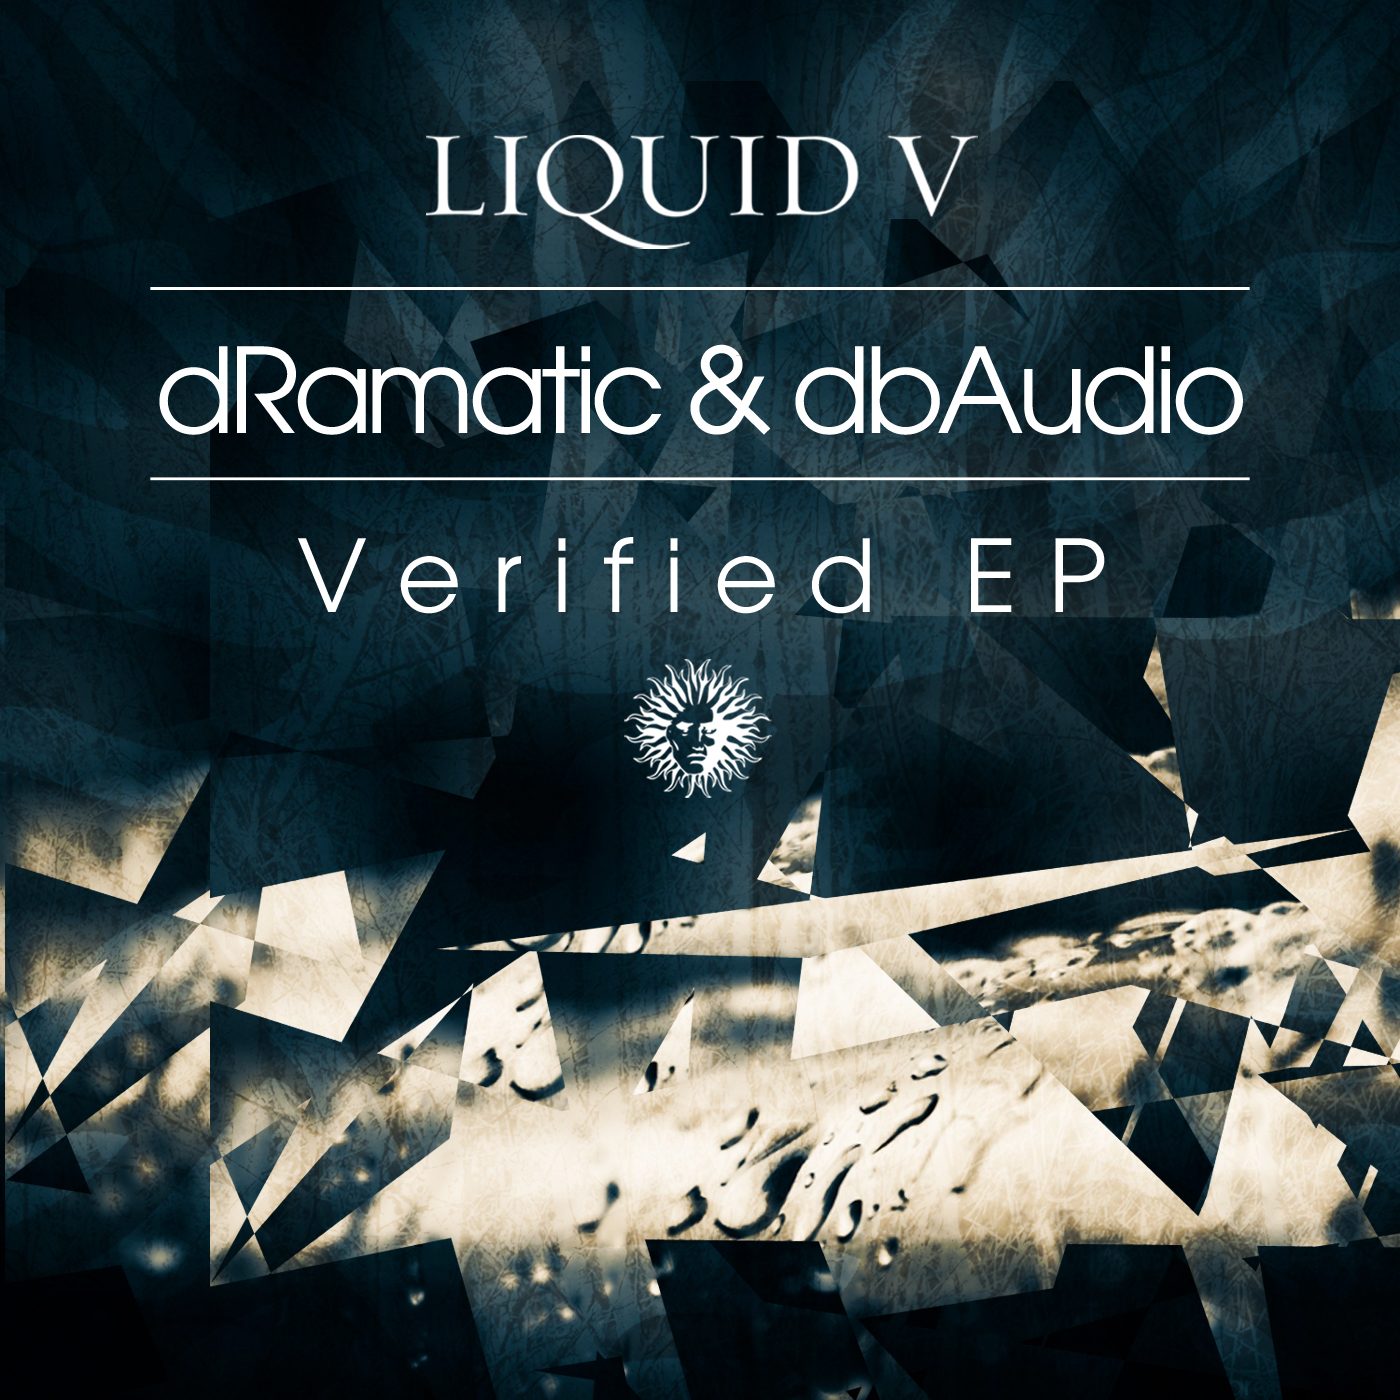 "Dramatic & DBAudio/VERIFIED 12"""